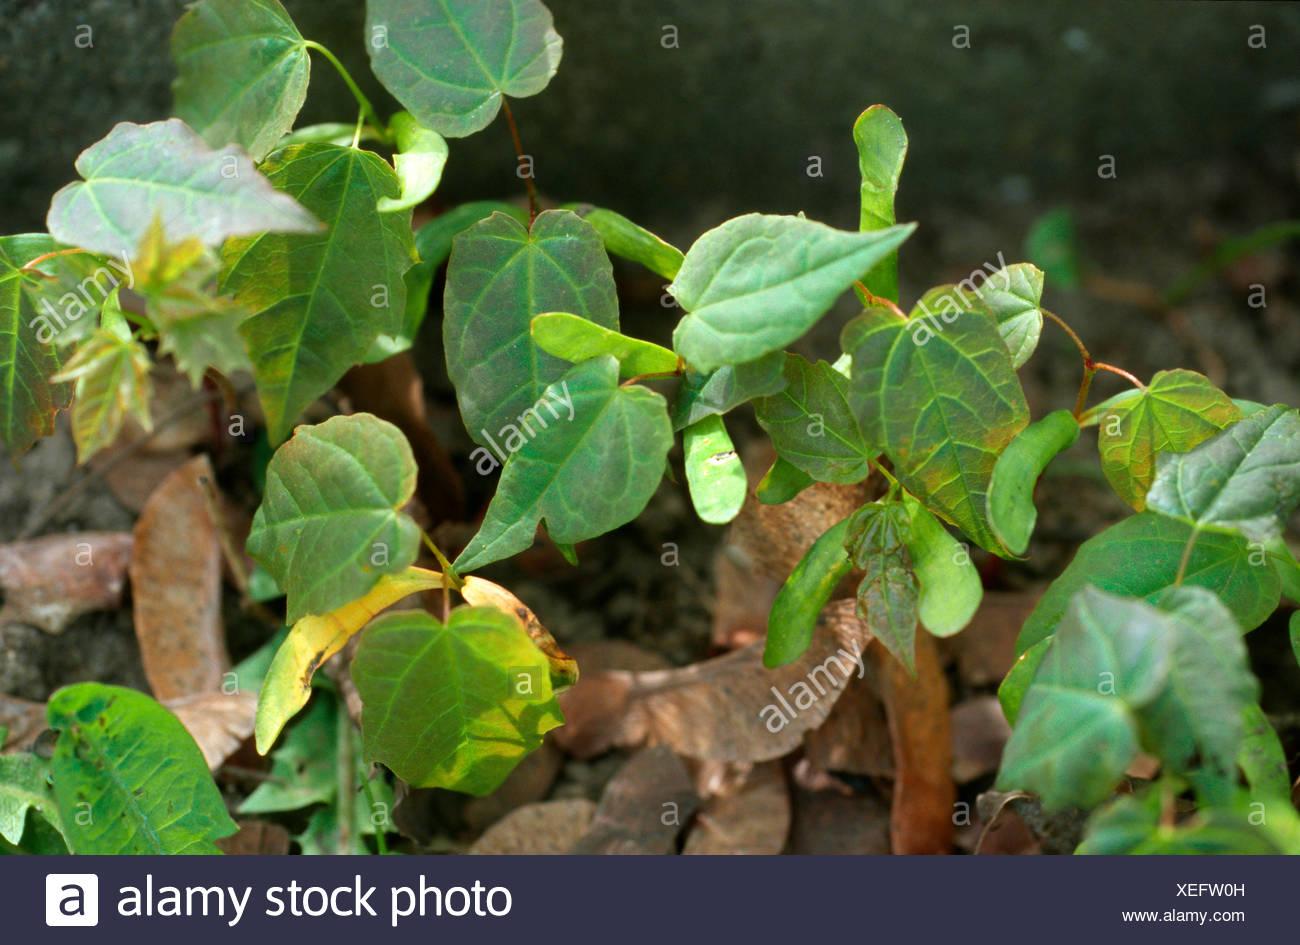 Spitz-Ahorn (Acer Platanoides), Keimlinge, Deutschland Stockfoto